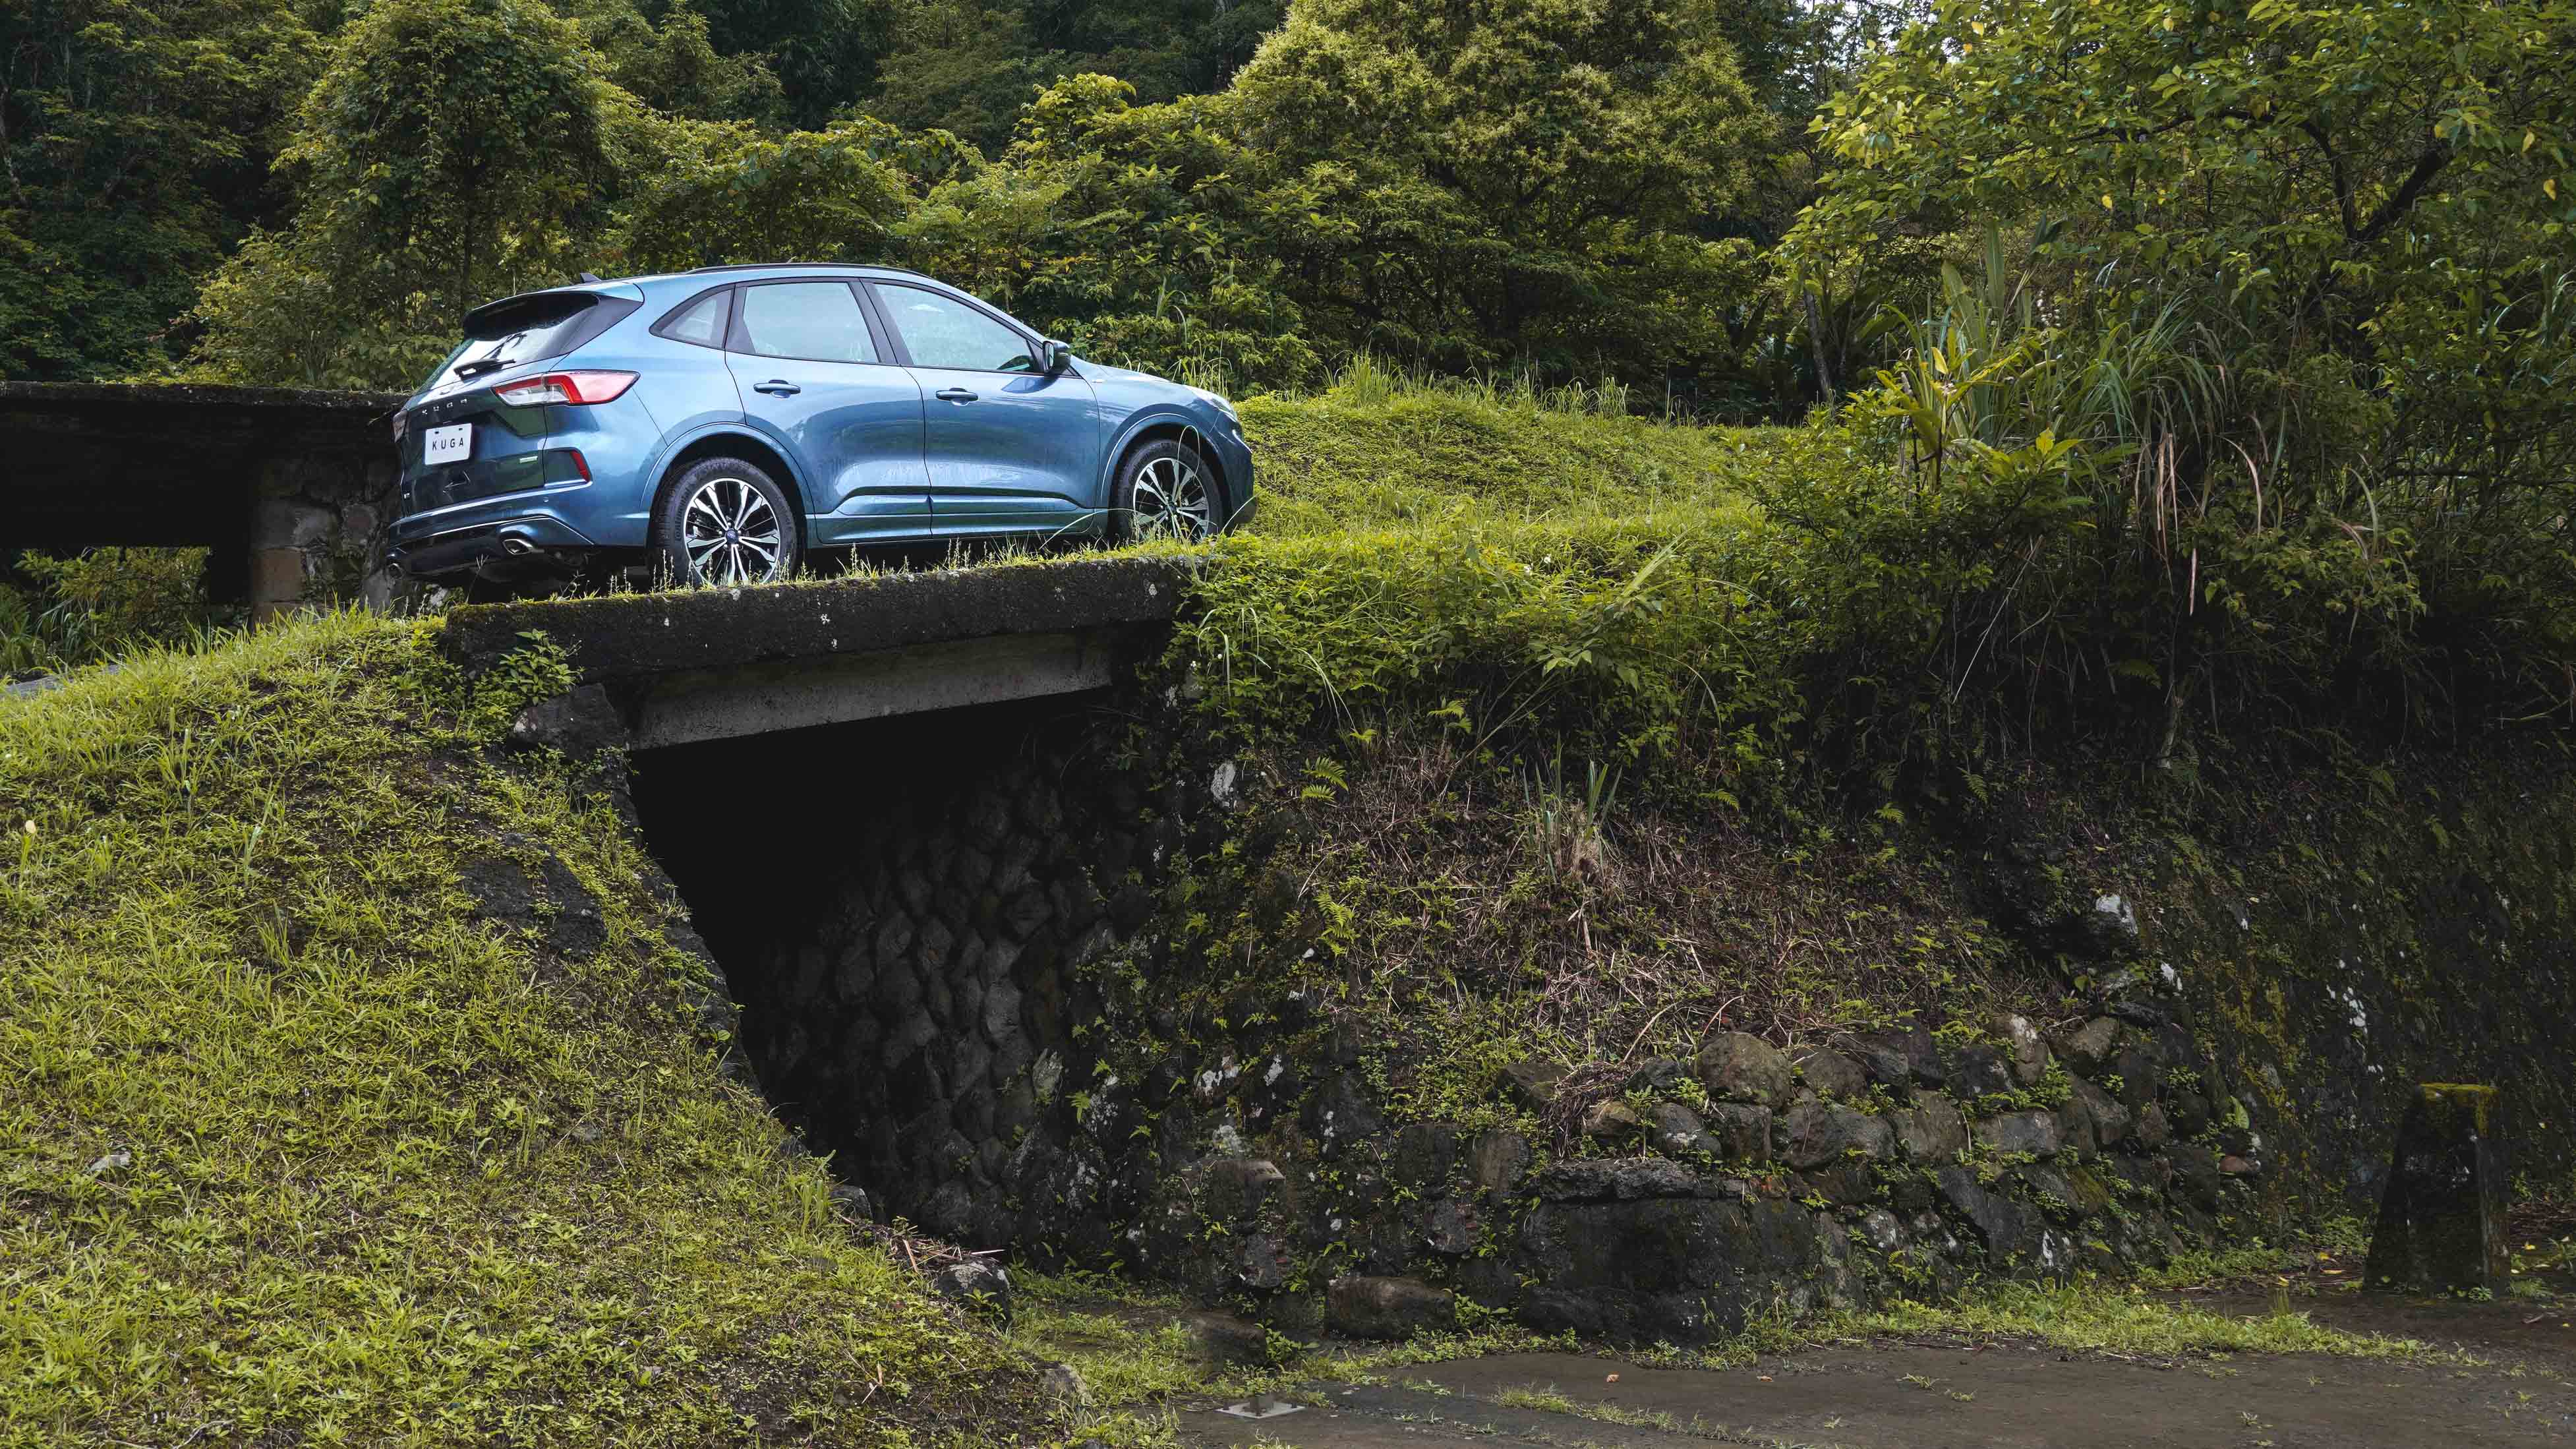 全新 Ford Kuga ST-Line 正式售價將於 6 月 17 日公佈,預計落在 110 至 120 萬間。